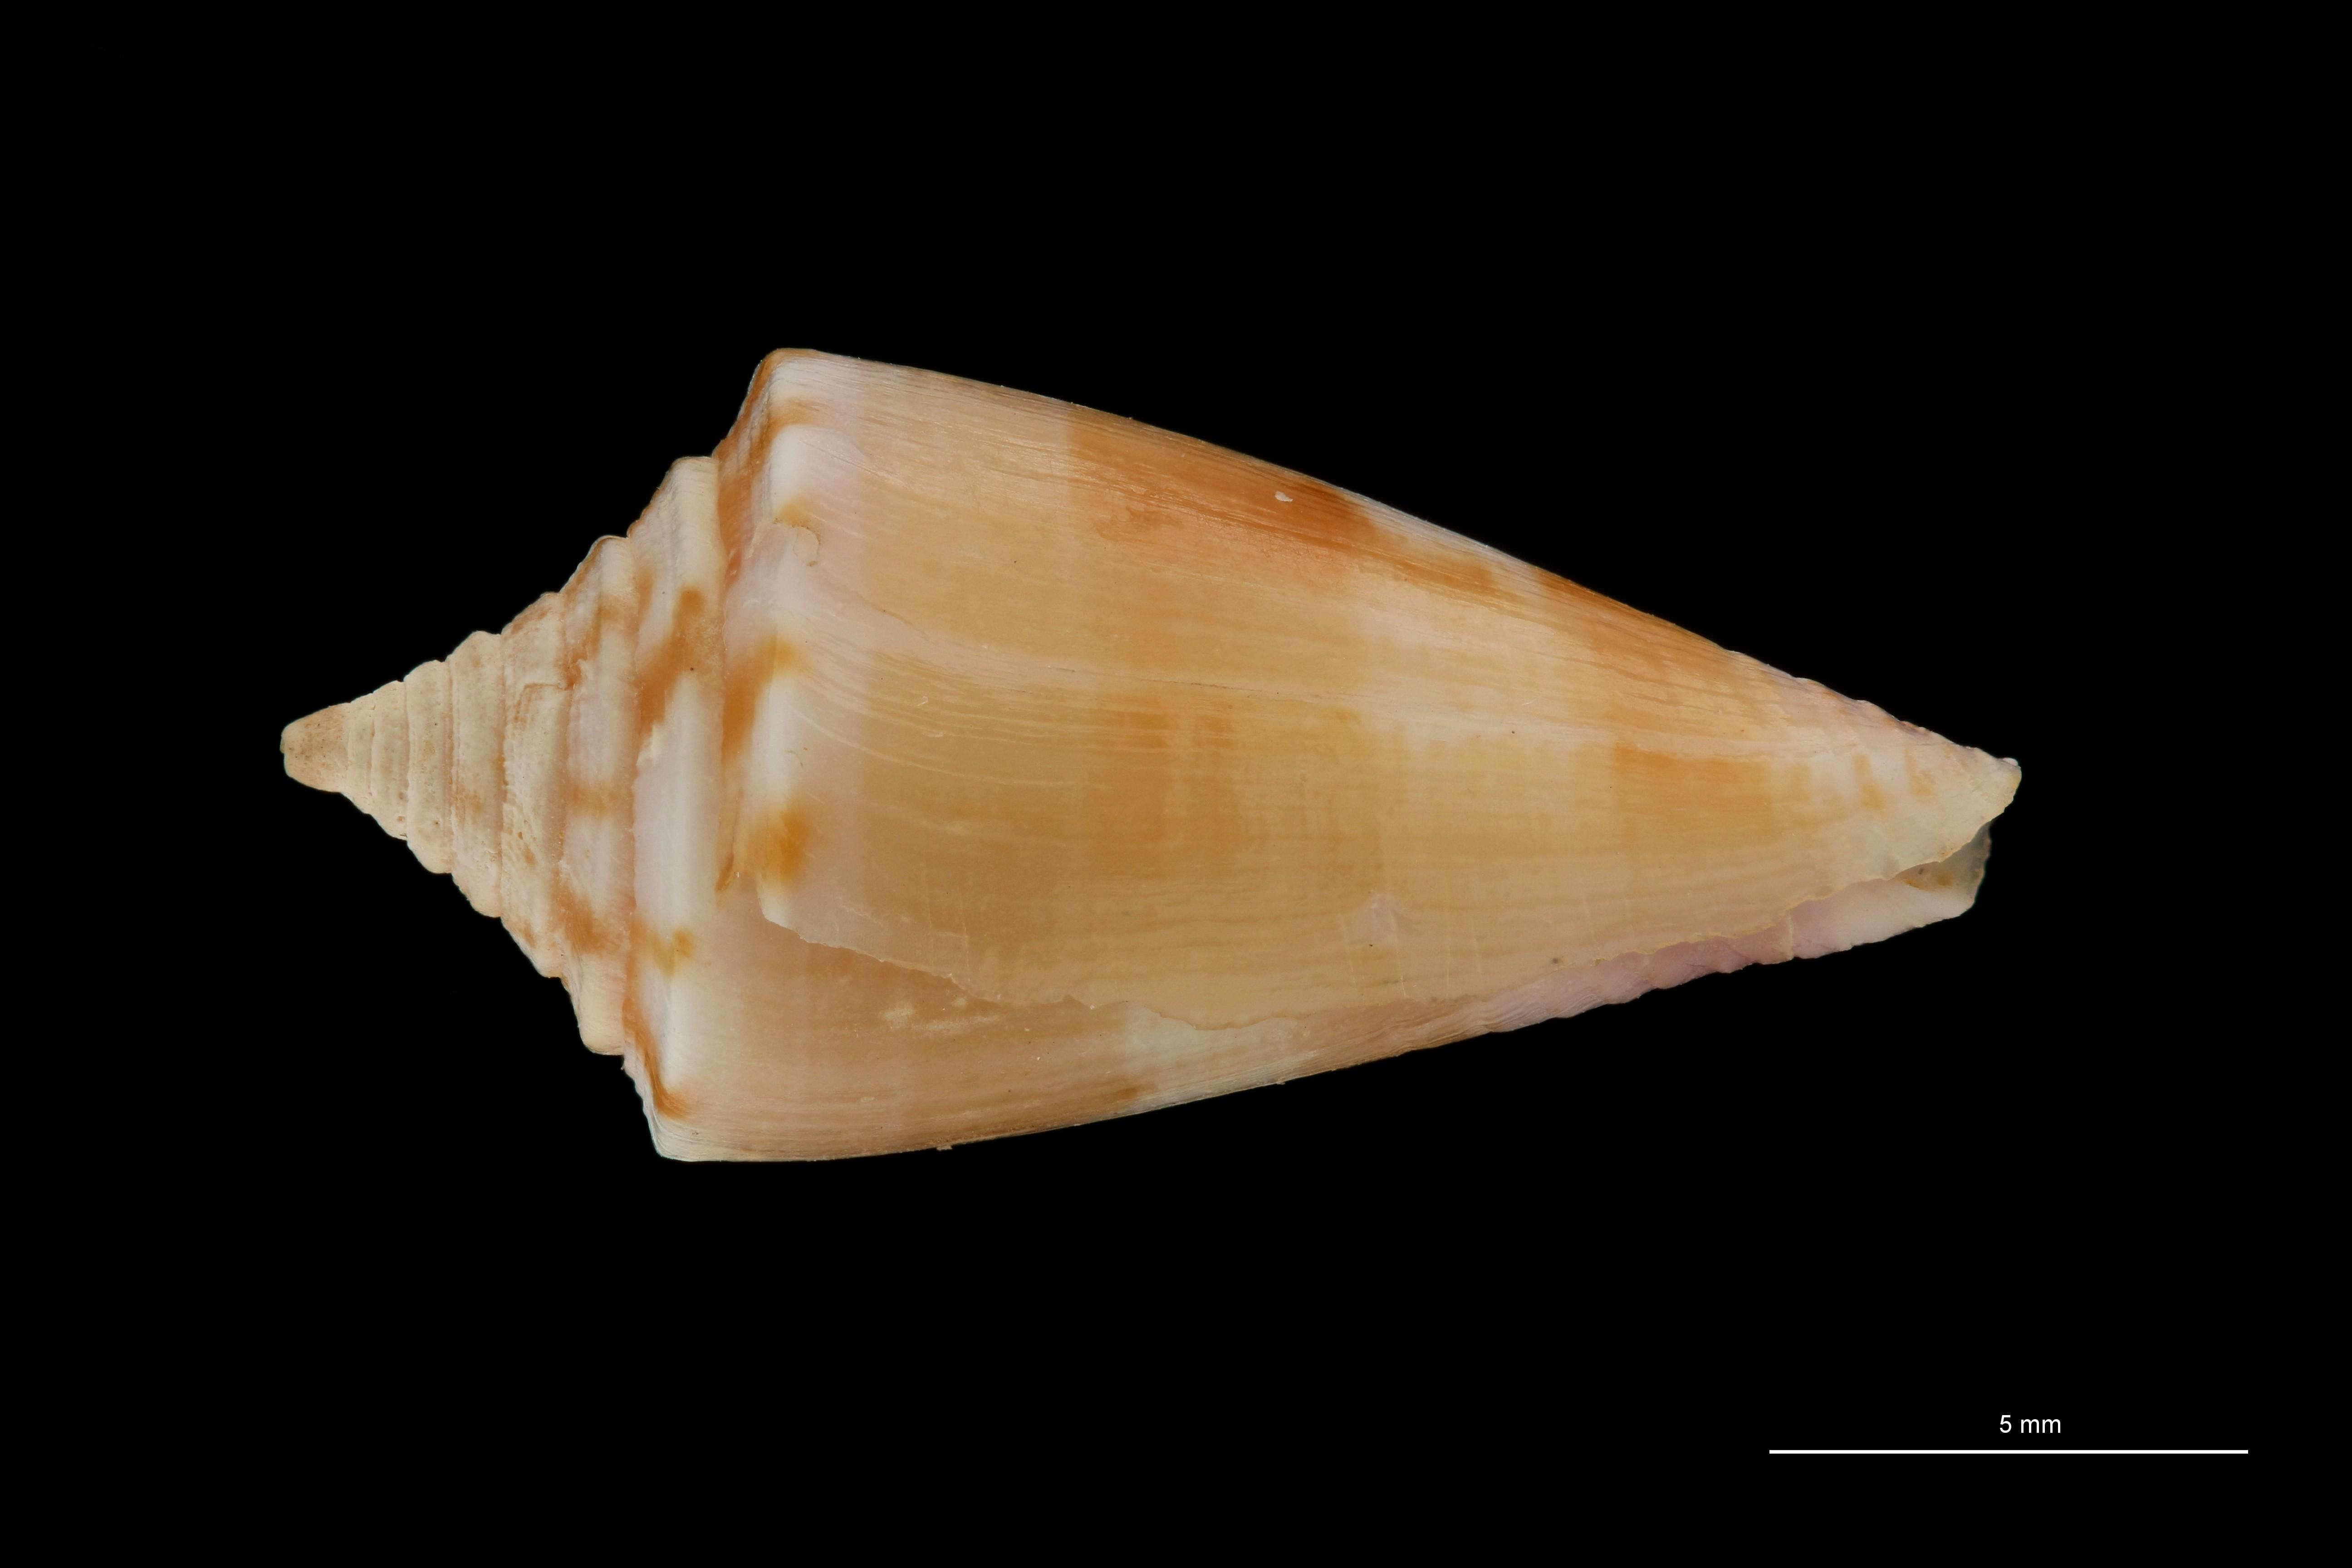 BE-RBINS-INV MT.3264 Conus subroseus Pt L ZS PMax Scaled.jpg